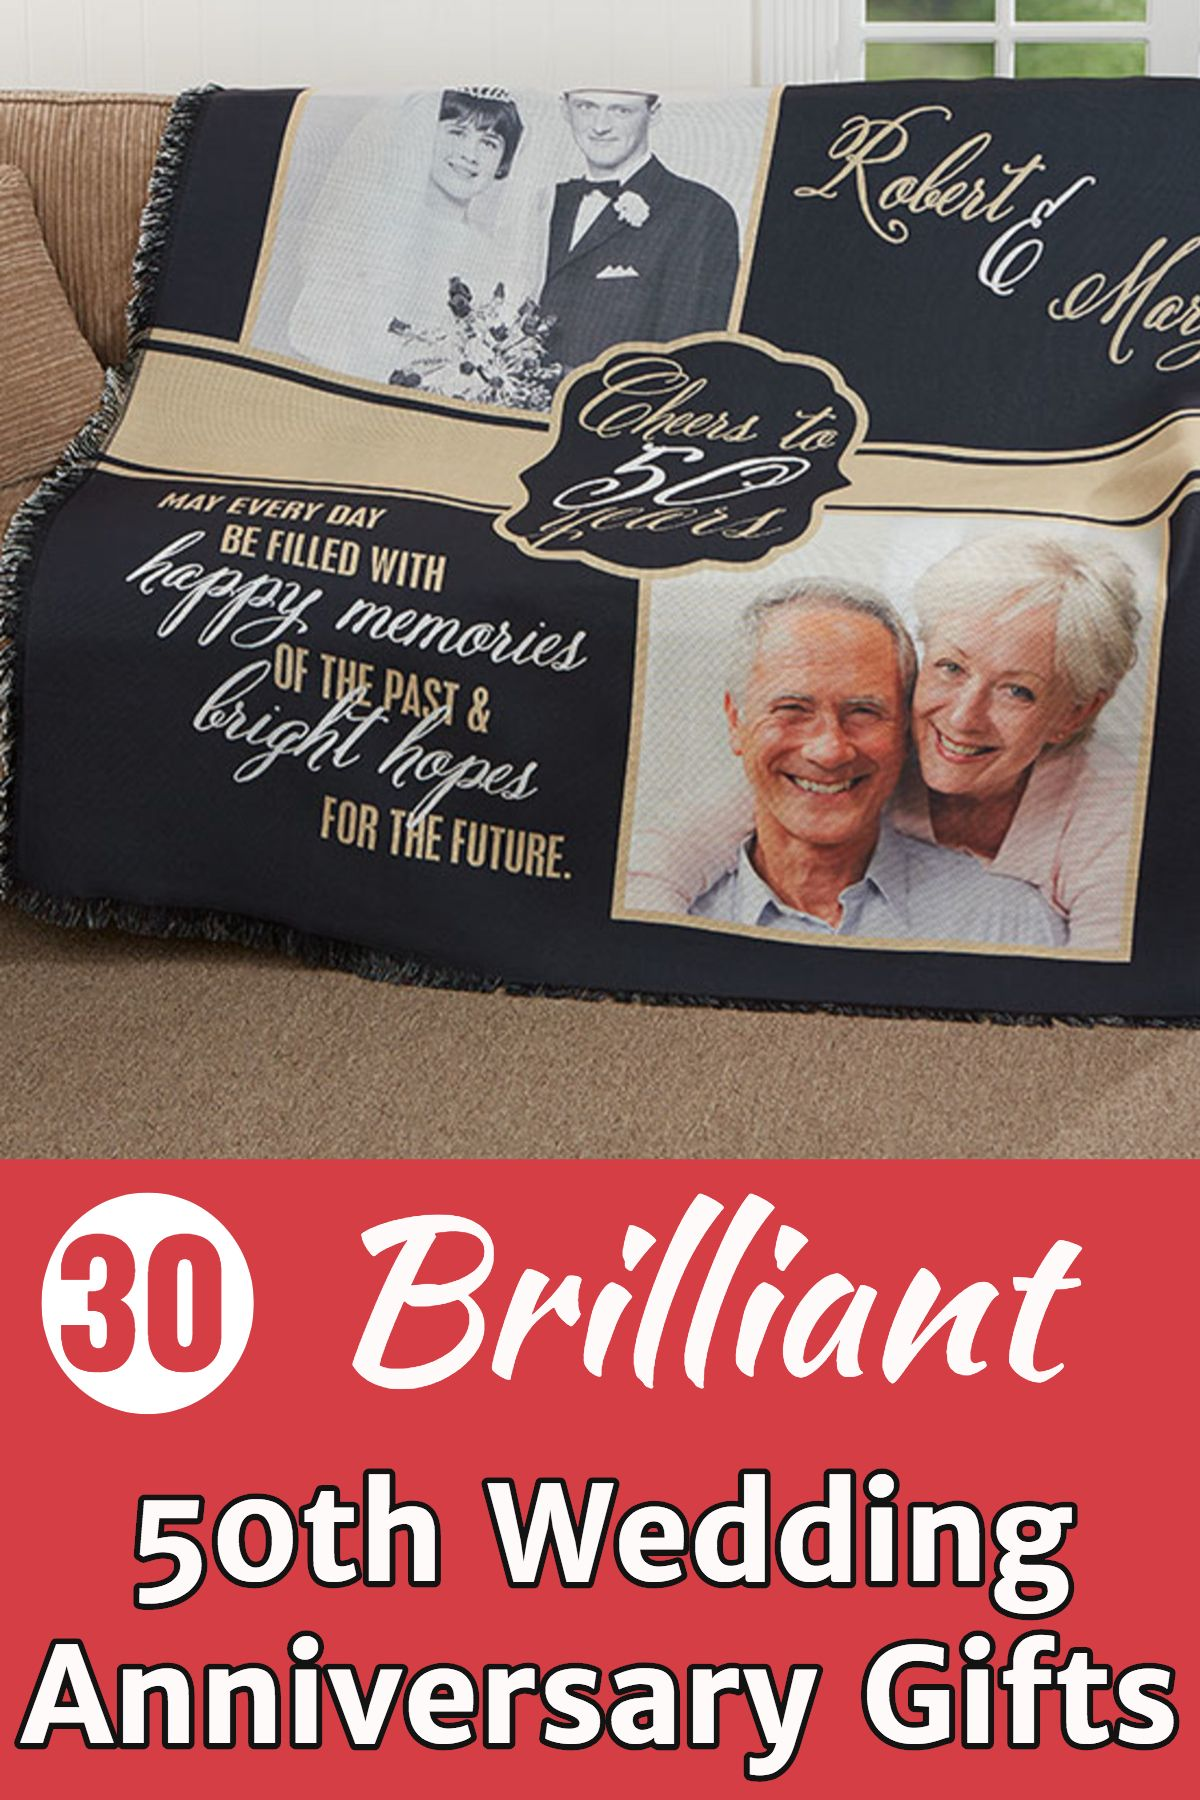 50th Wedding Anniversary Gifts Best Gift Ideas For A Golden Anniversary 50 Wedding Anniversary Gifts Golden Anniversary Gifts 50th Anniversary Gifts